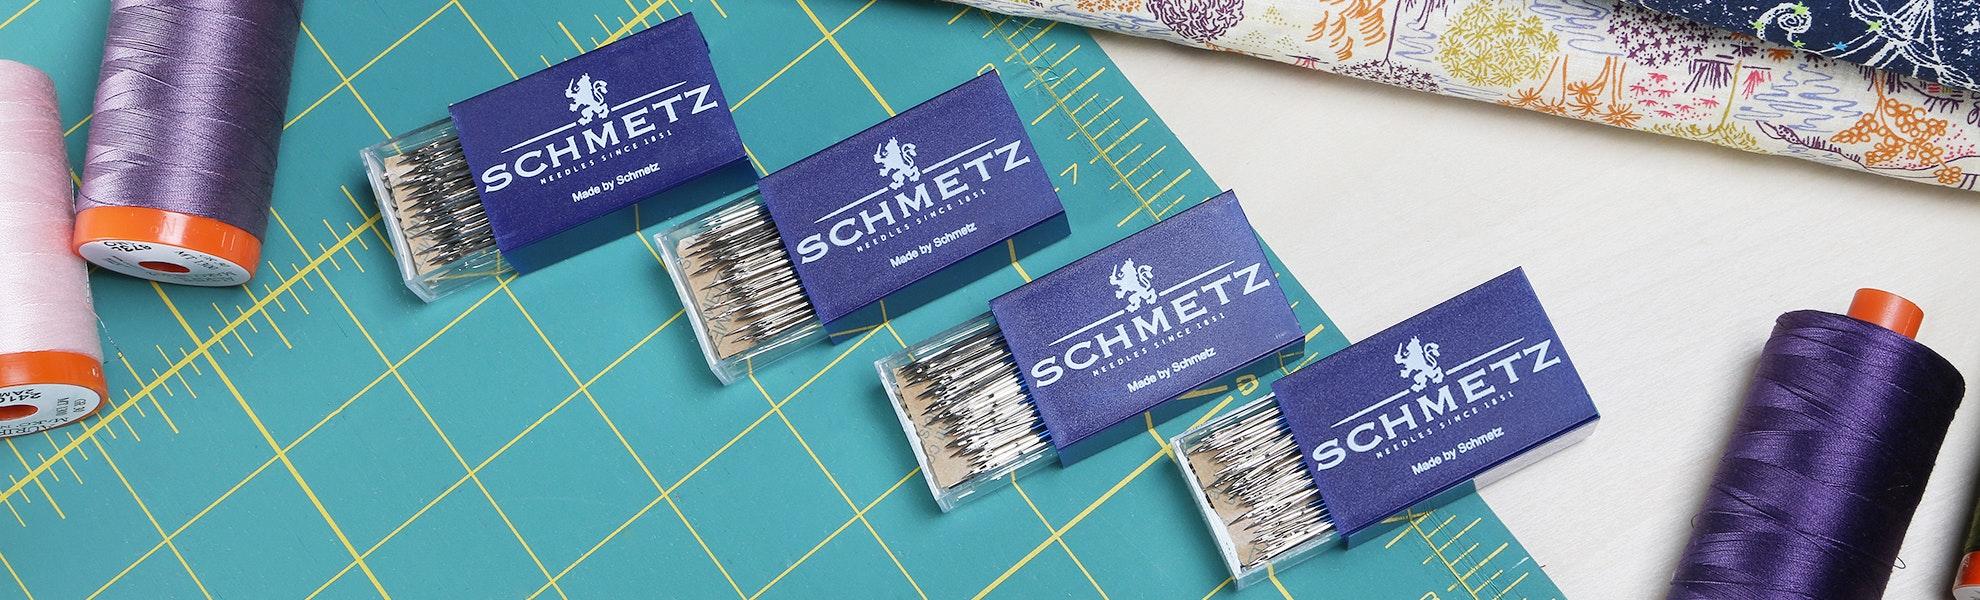 Schmetz Microtex Needles (100/box)